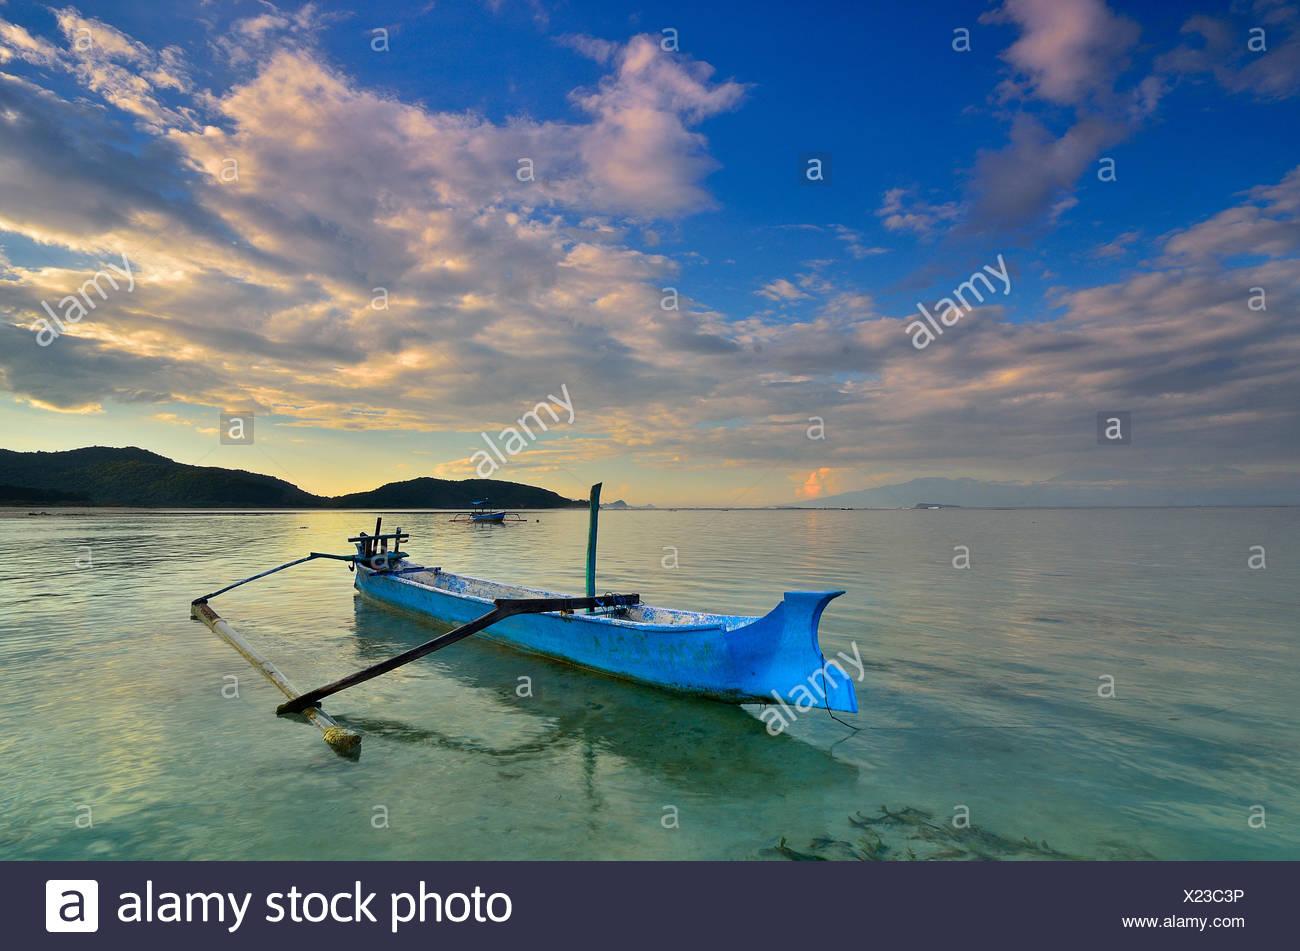 Boat anchored at Jelenga Beach, Sumbawa Island, Indonesia - Stock Image